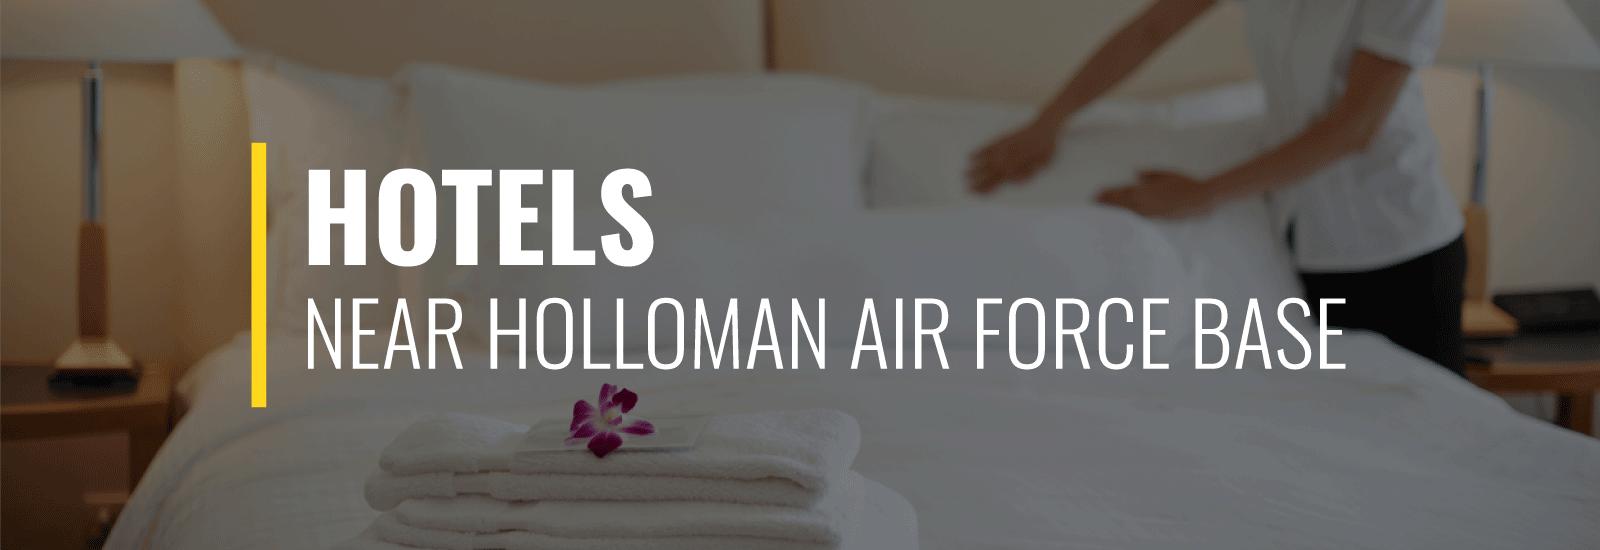 Holloman AFB Hotels